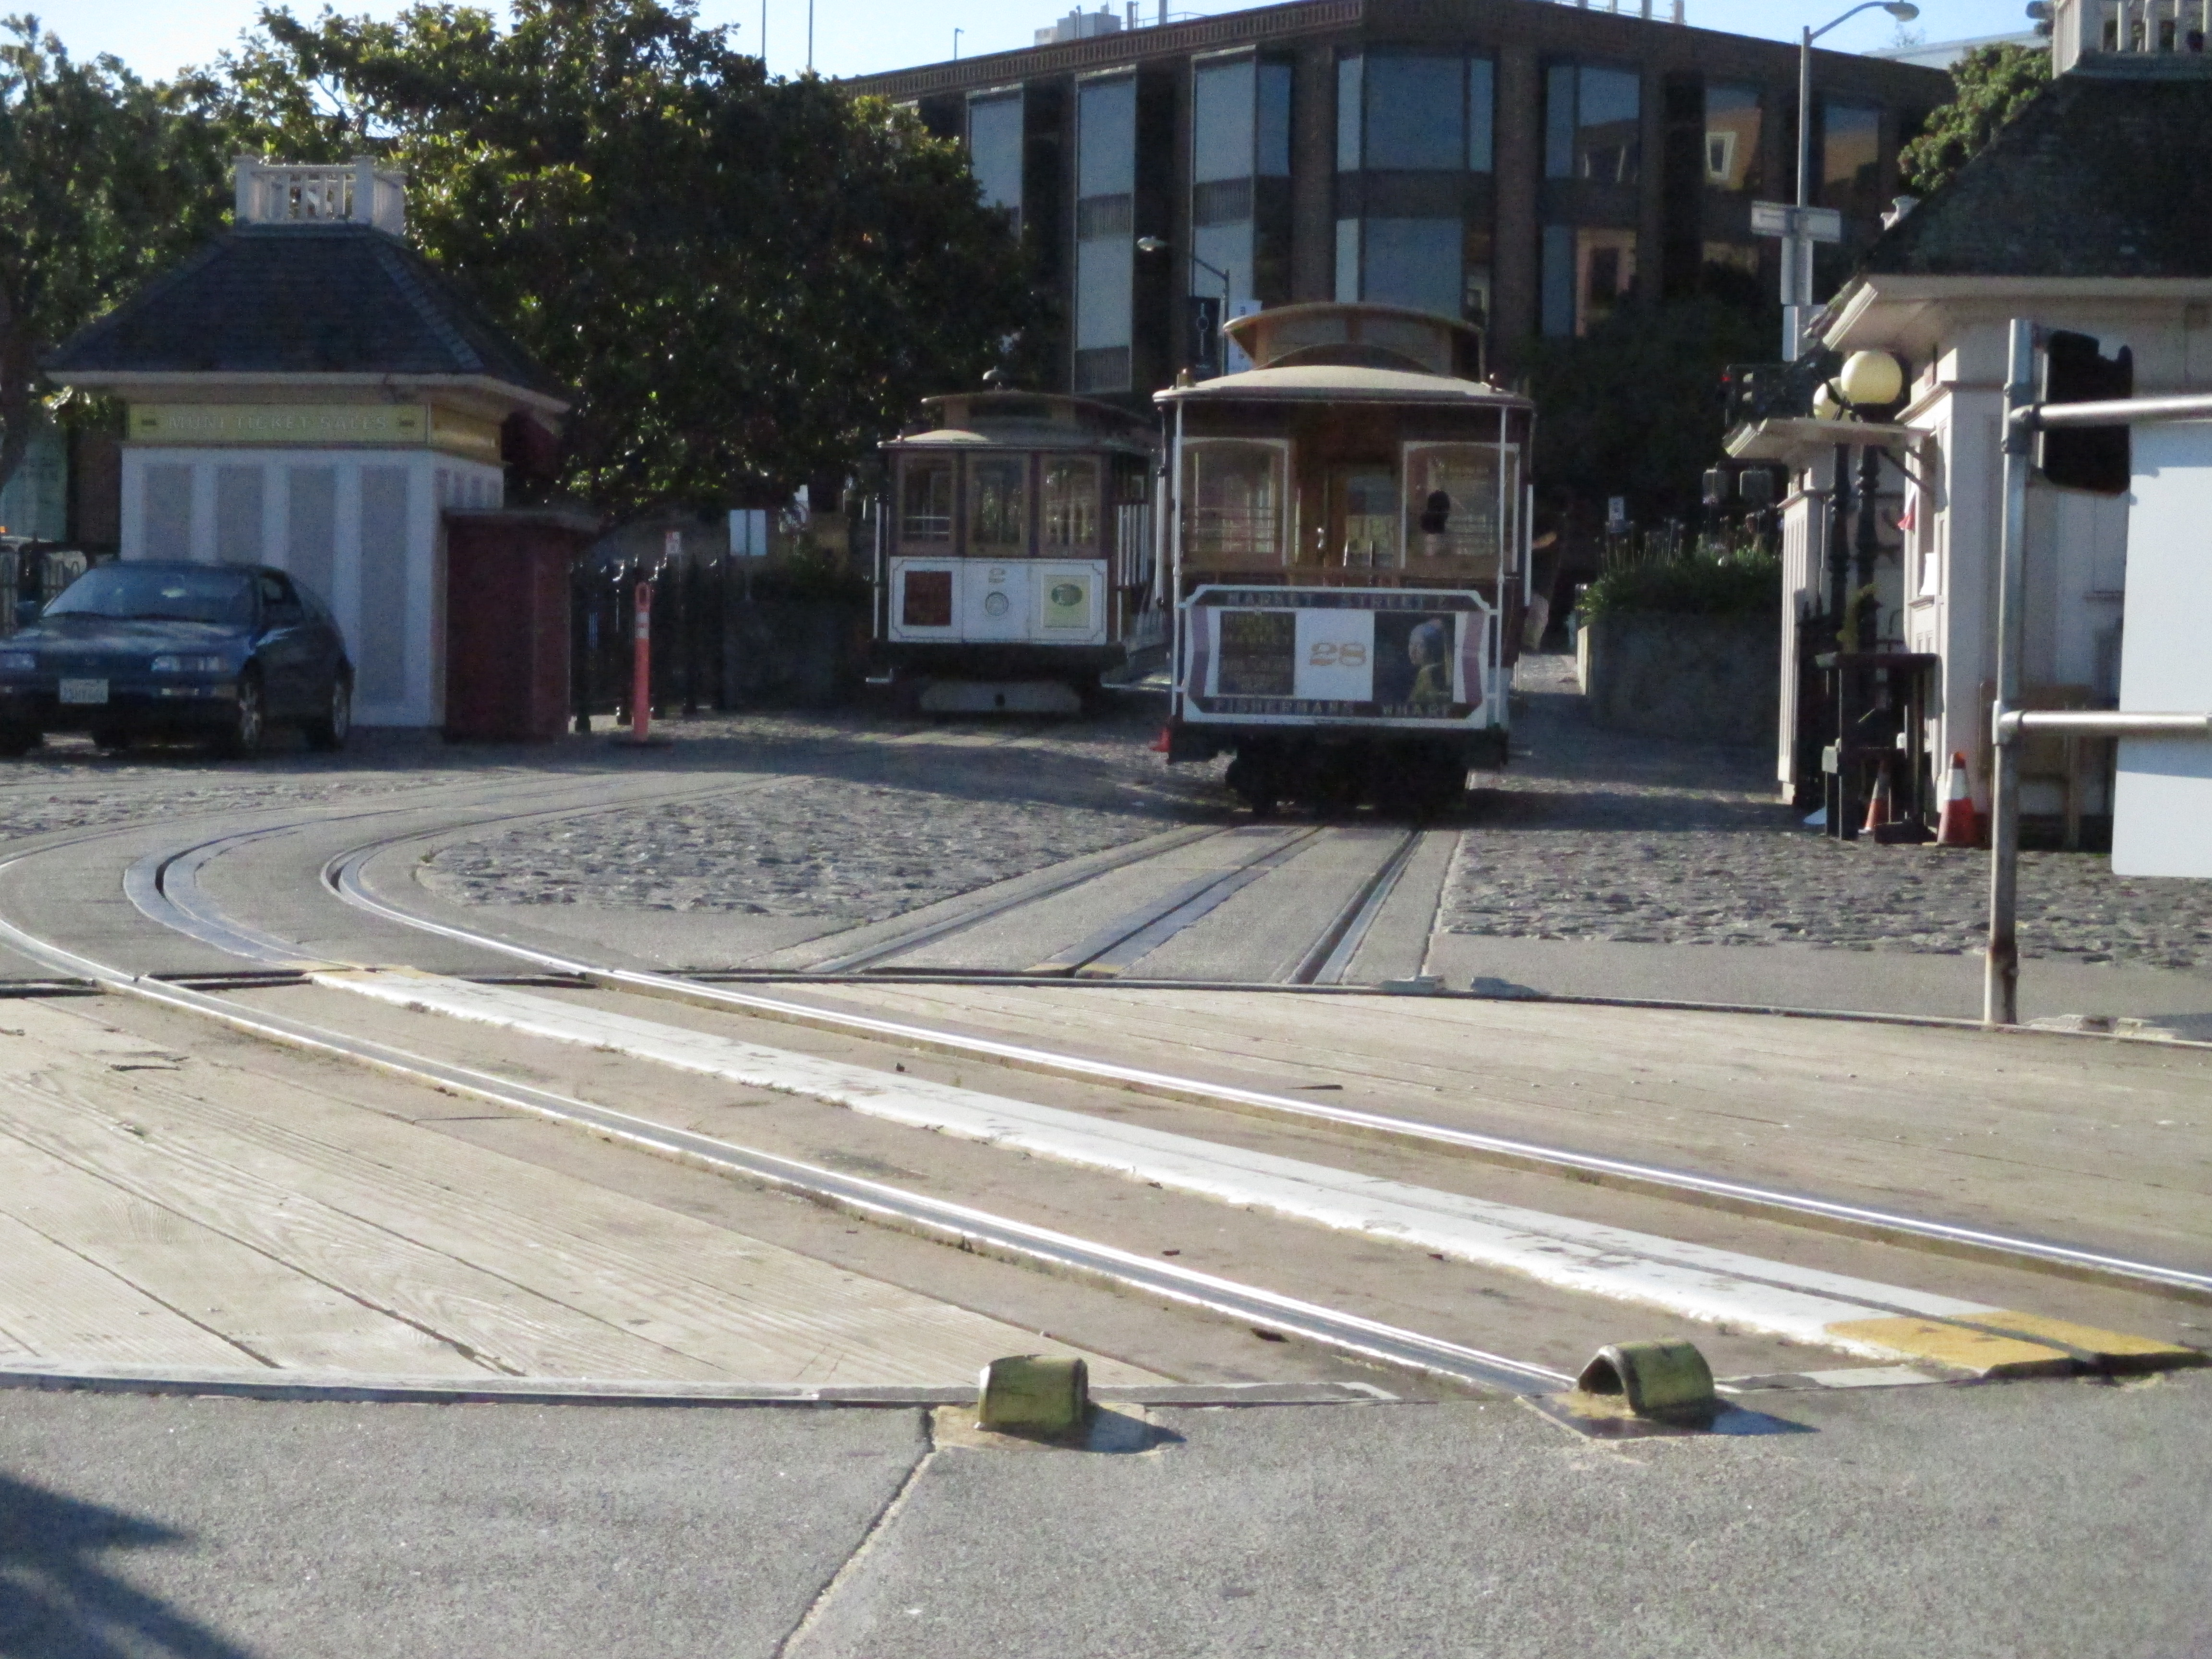 Cable Car turnaround